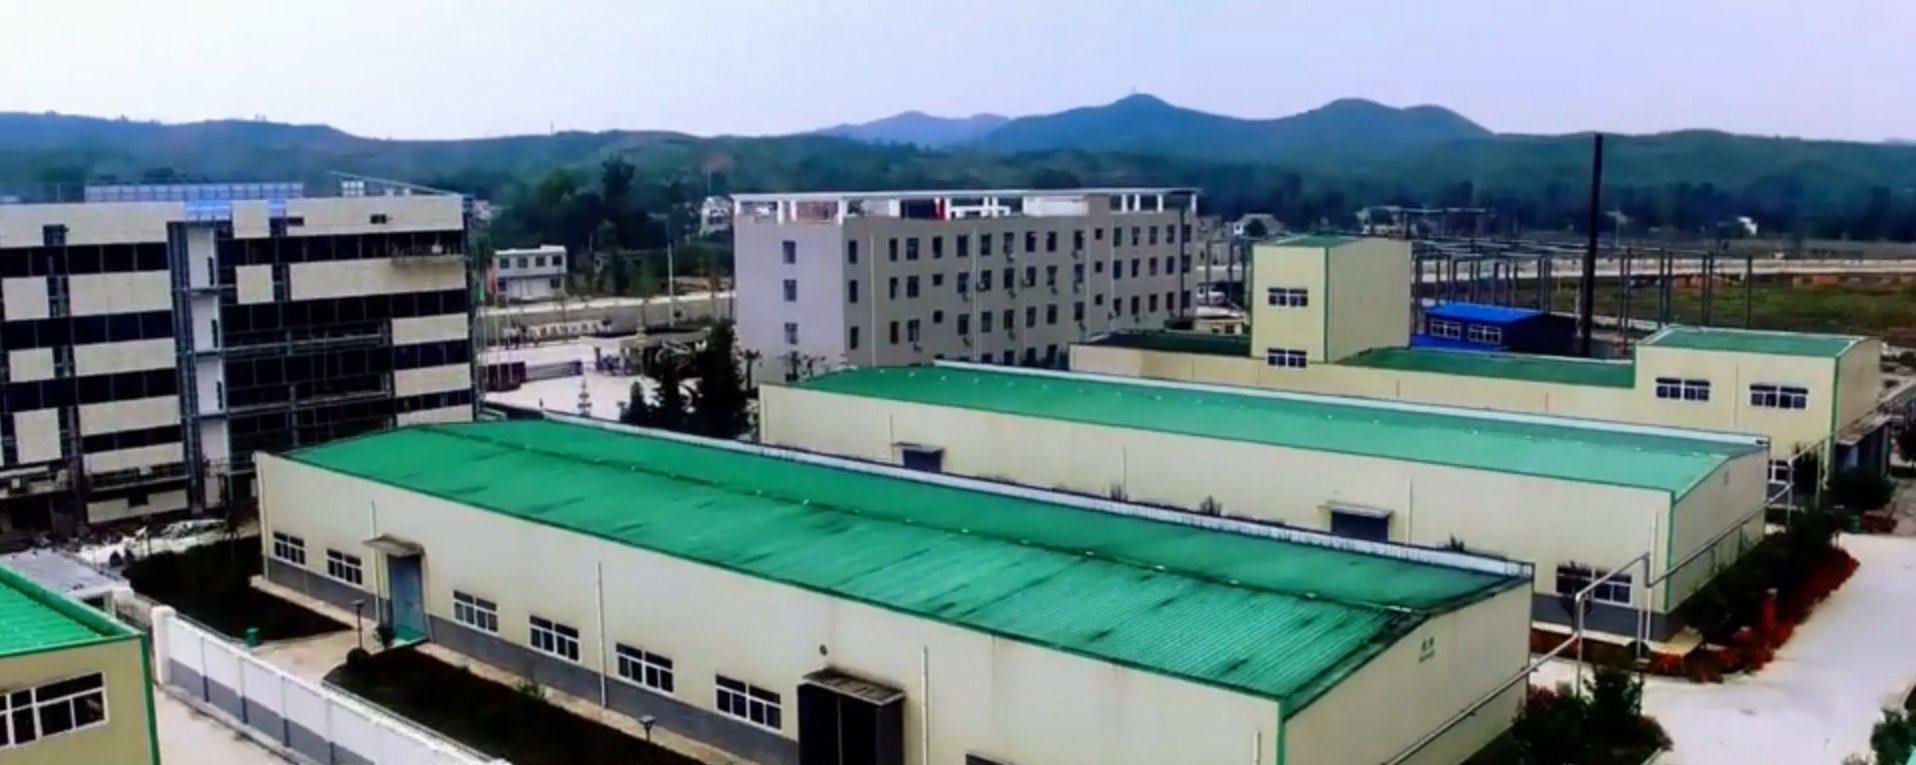 Manufacturer Supply 100% Natural Cortex Dictamni Extract